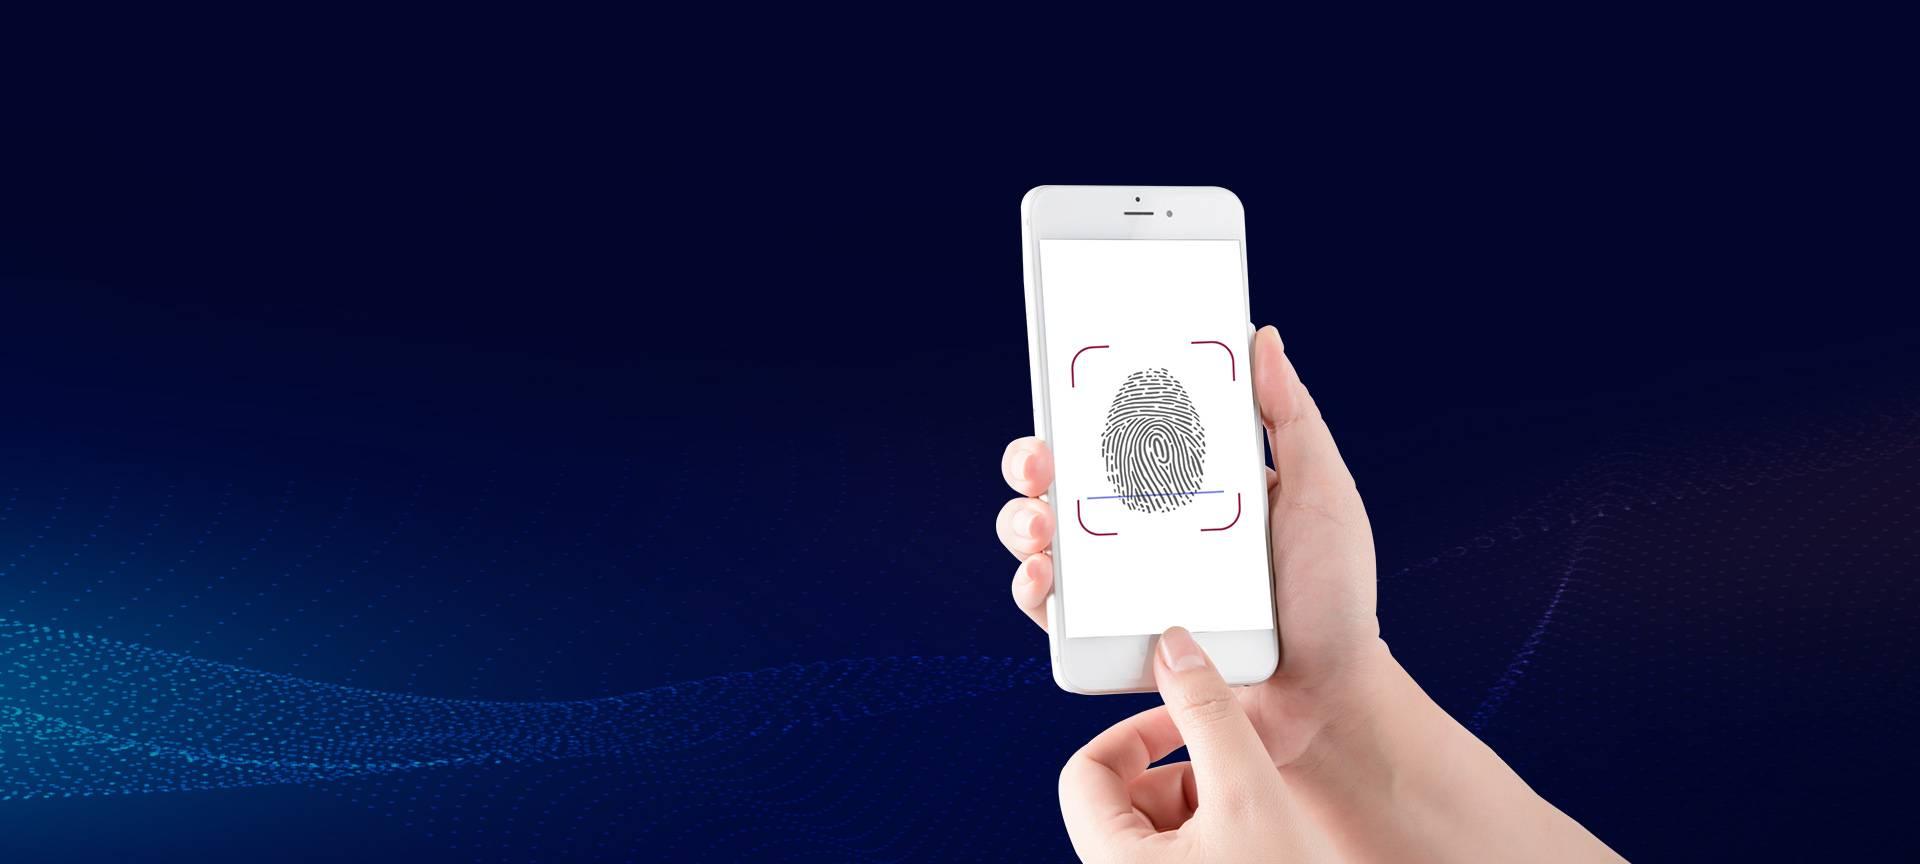 Fingerprint identification module products